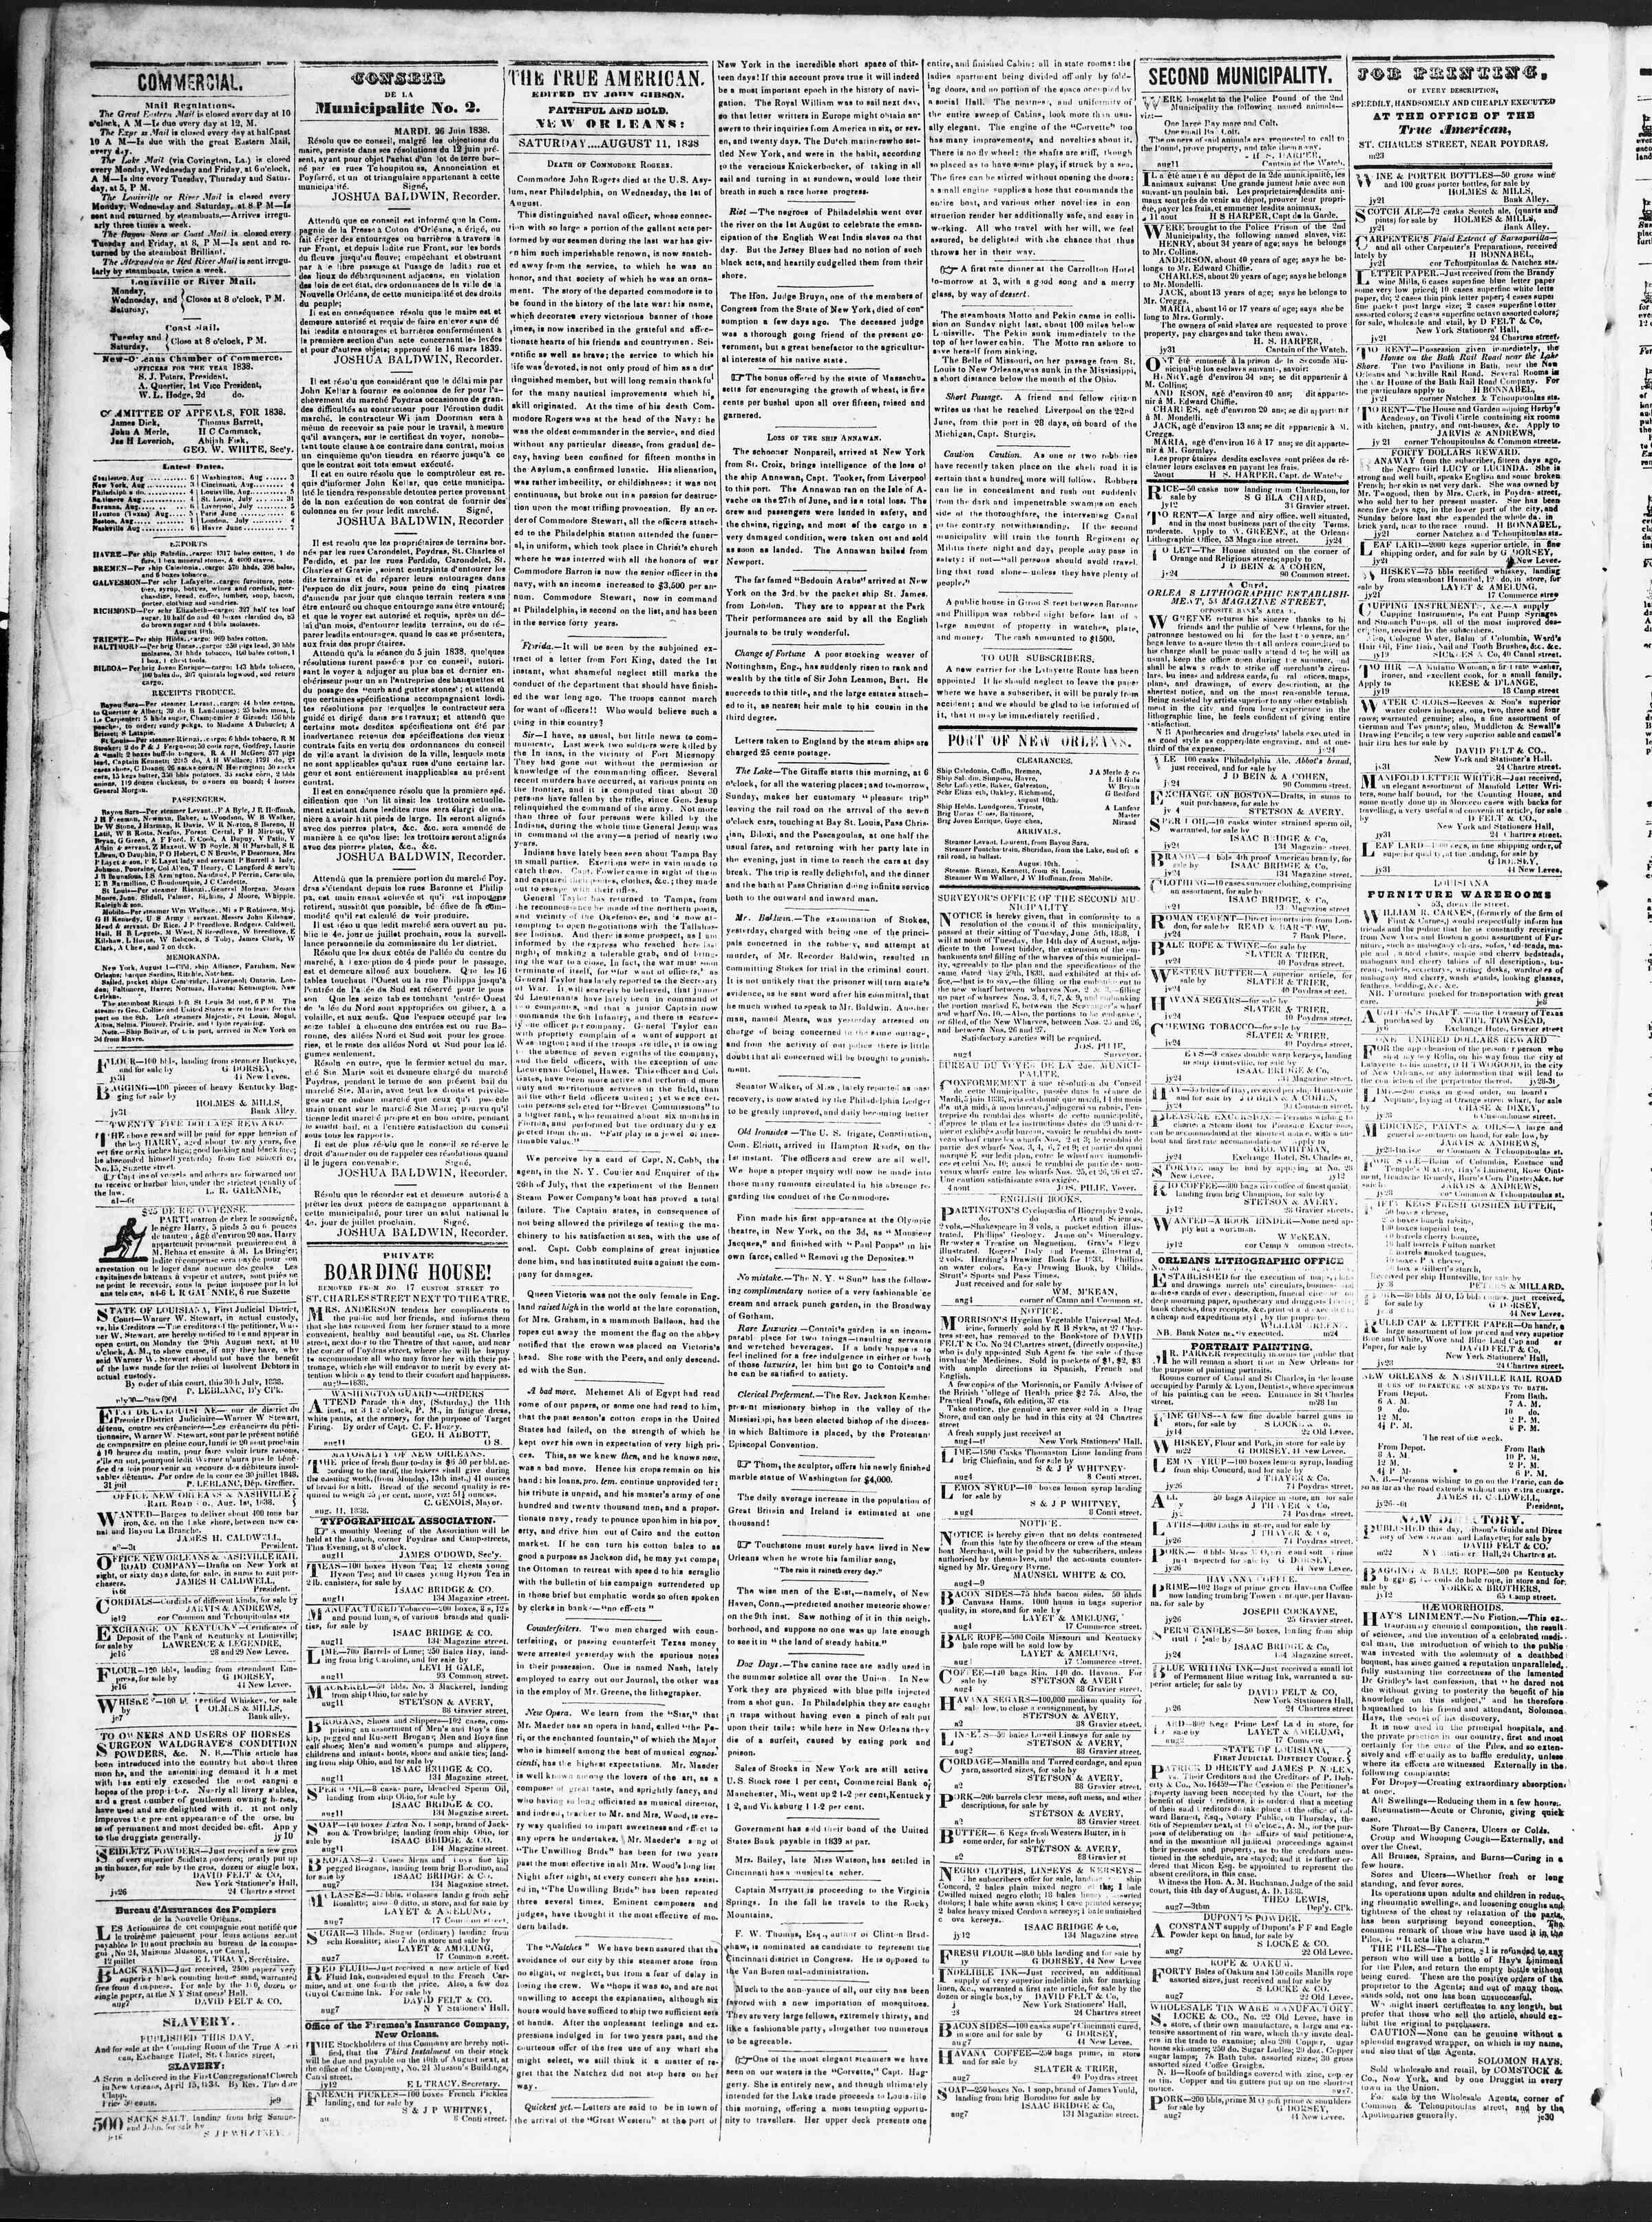 August 11, 1838 Tarihli True American Gazetesi Sayfa 2